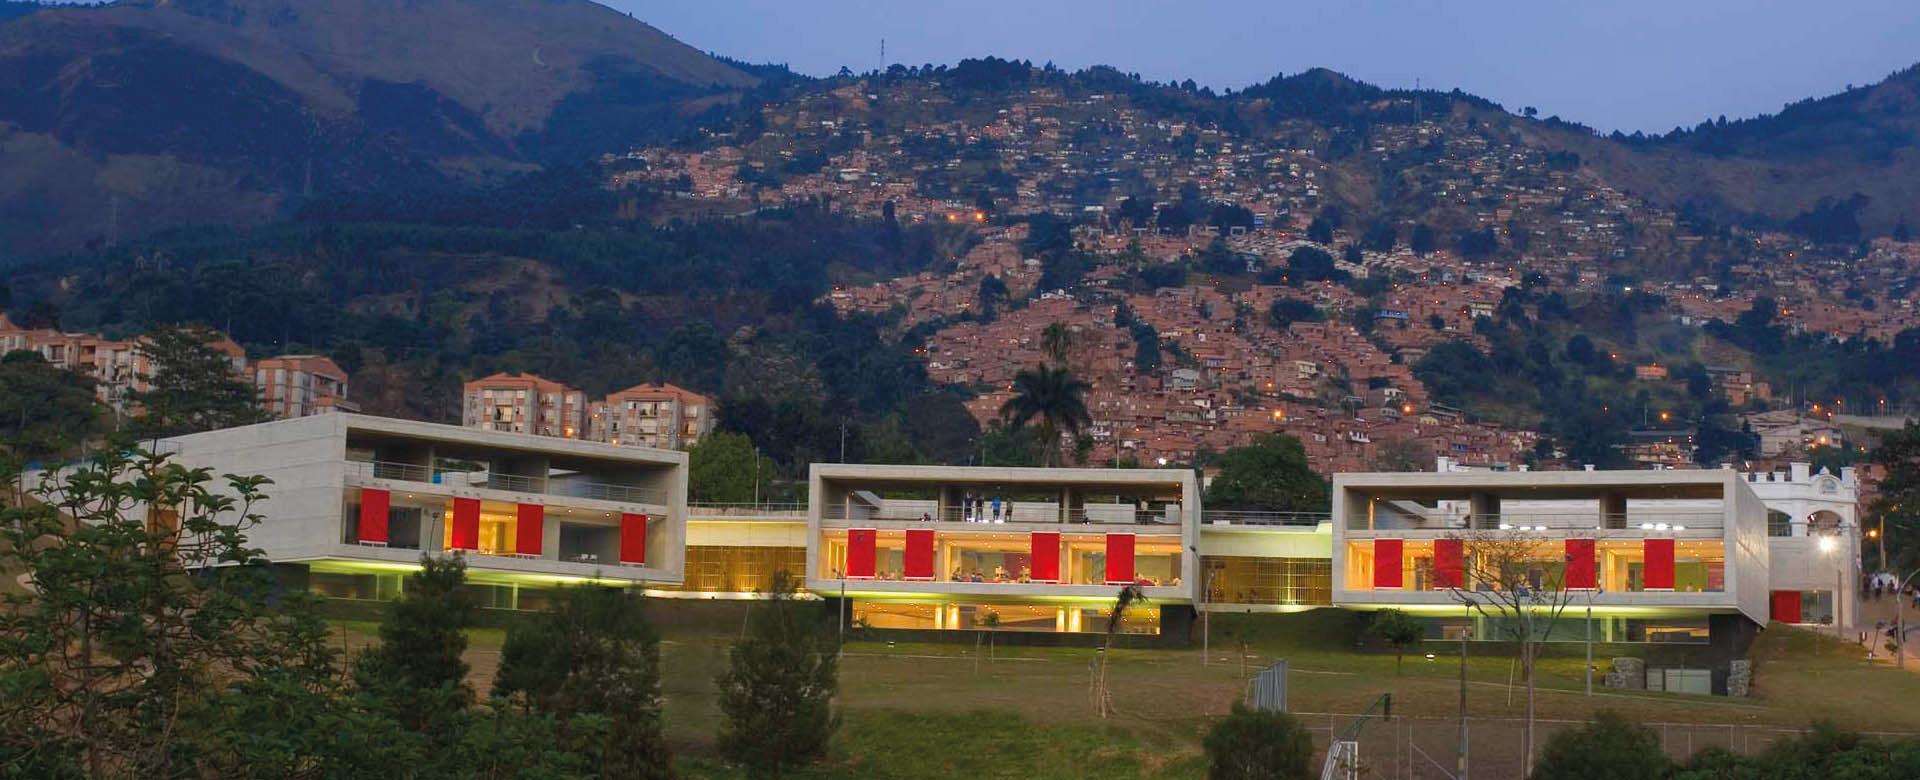 019 Leon De Greiff Library Park El Equipo Mazzanti